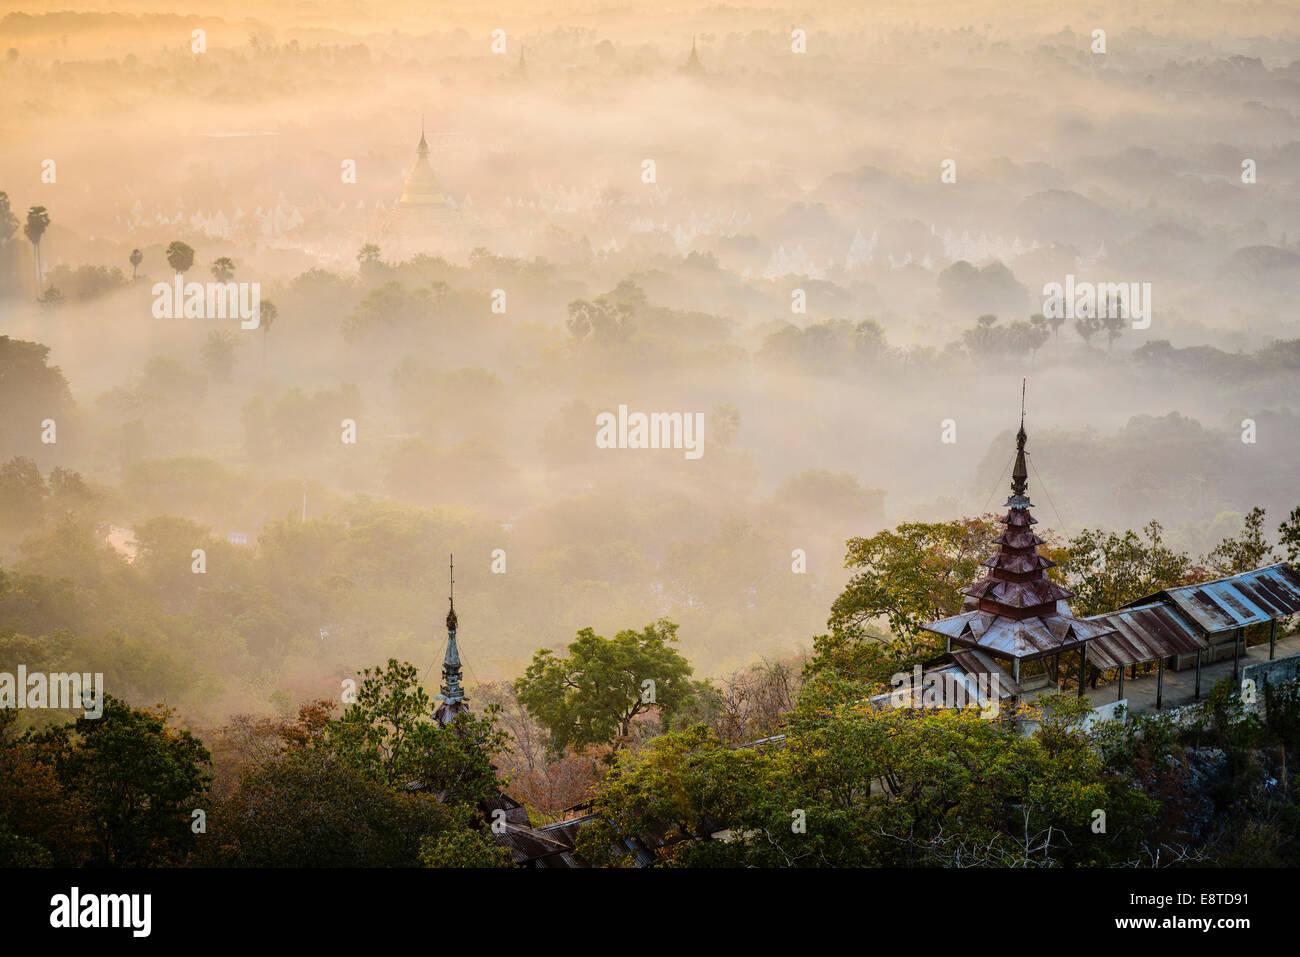 Brouillard sur la cime des arbres, Myanmar, Mandalay, Myanmar Photo Stock